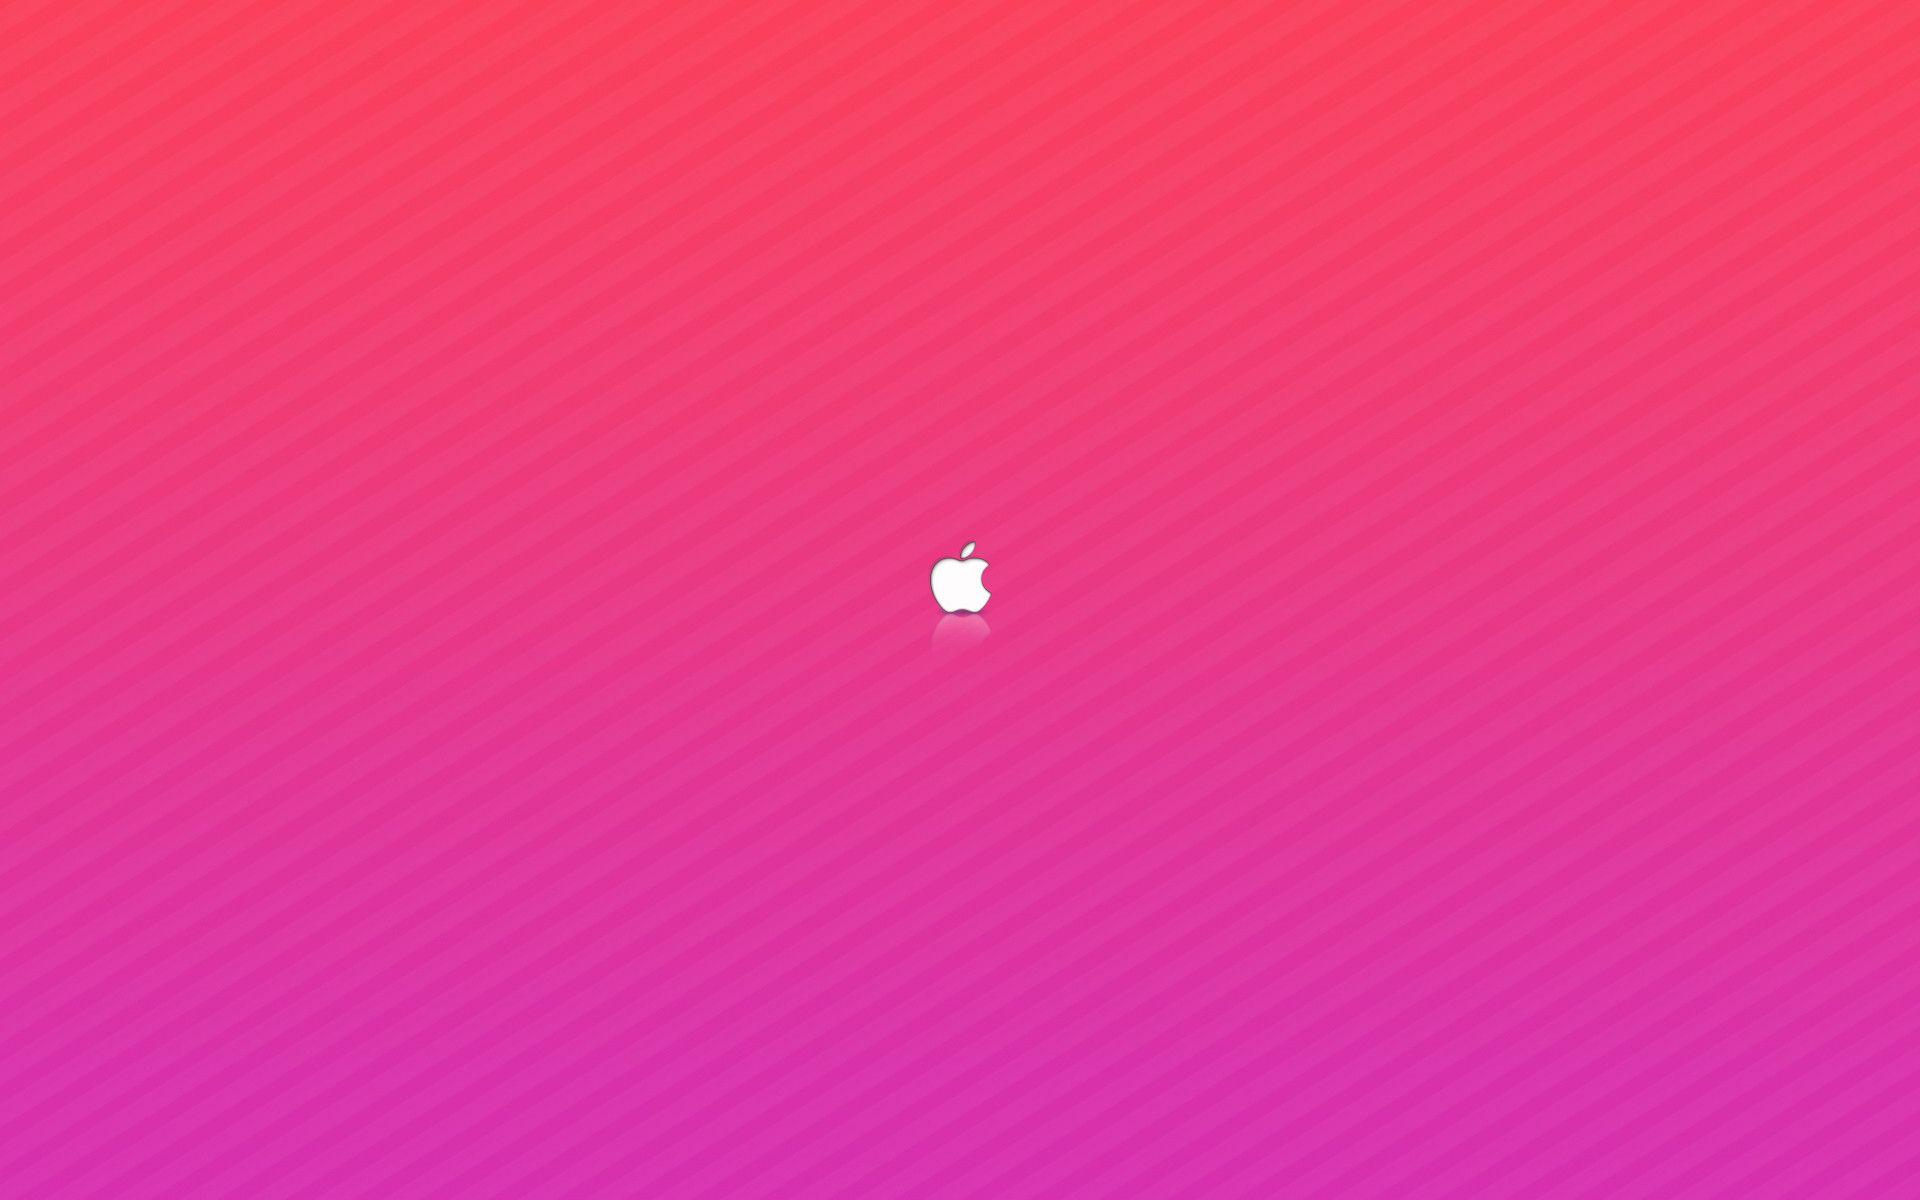 Pink Mac Wallpapers - Wallpaper Cave